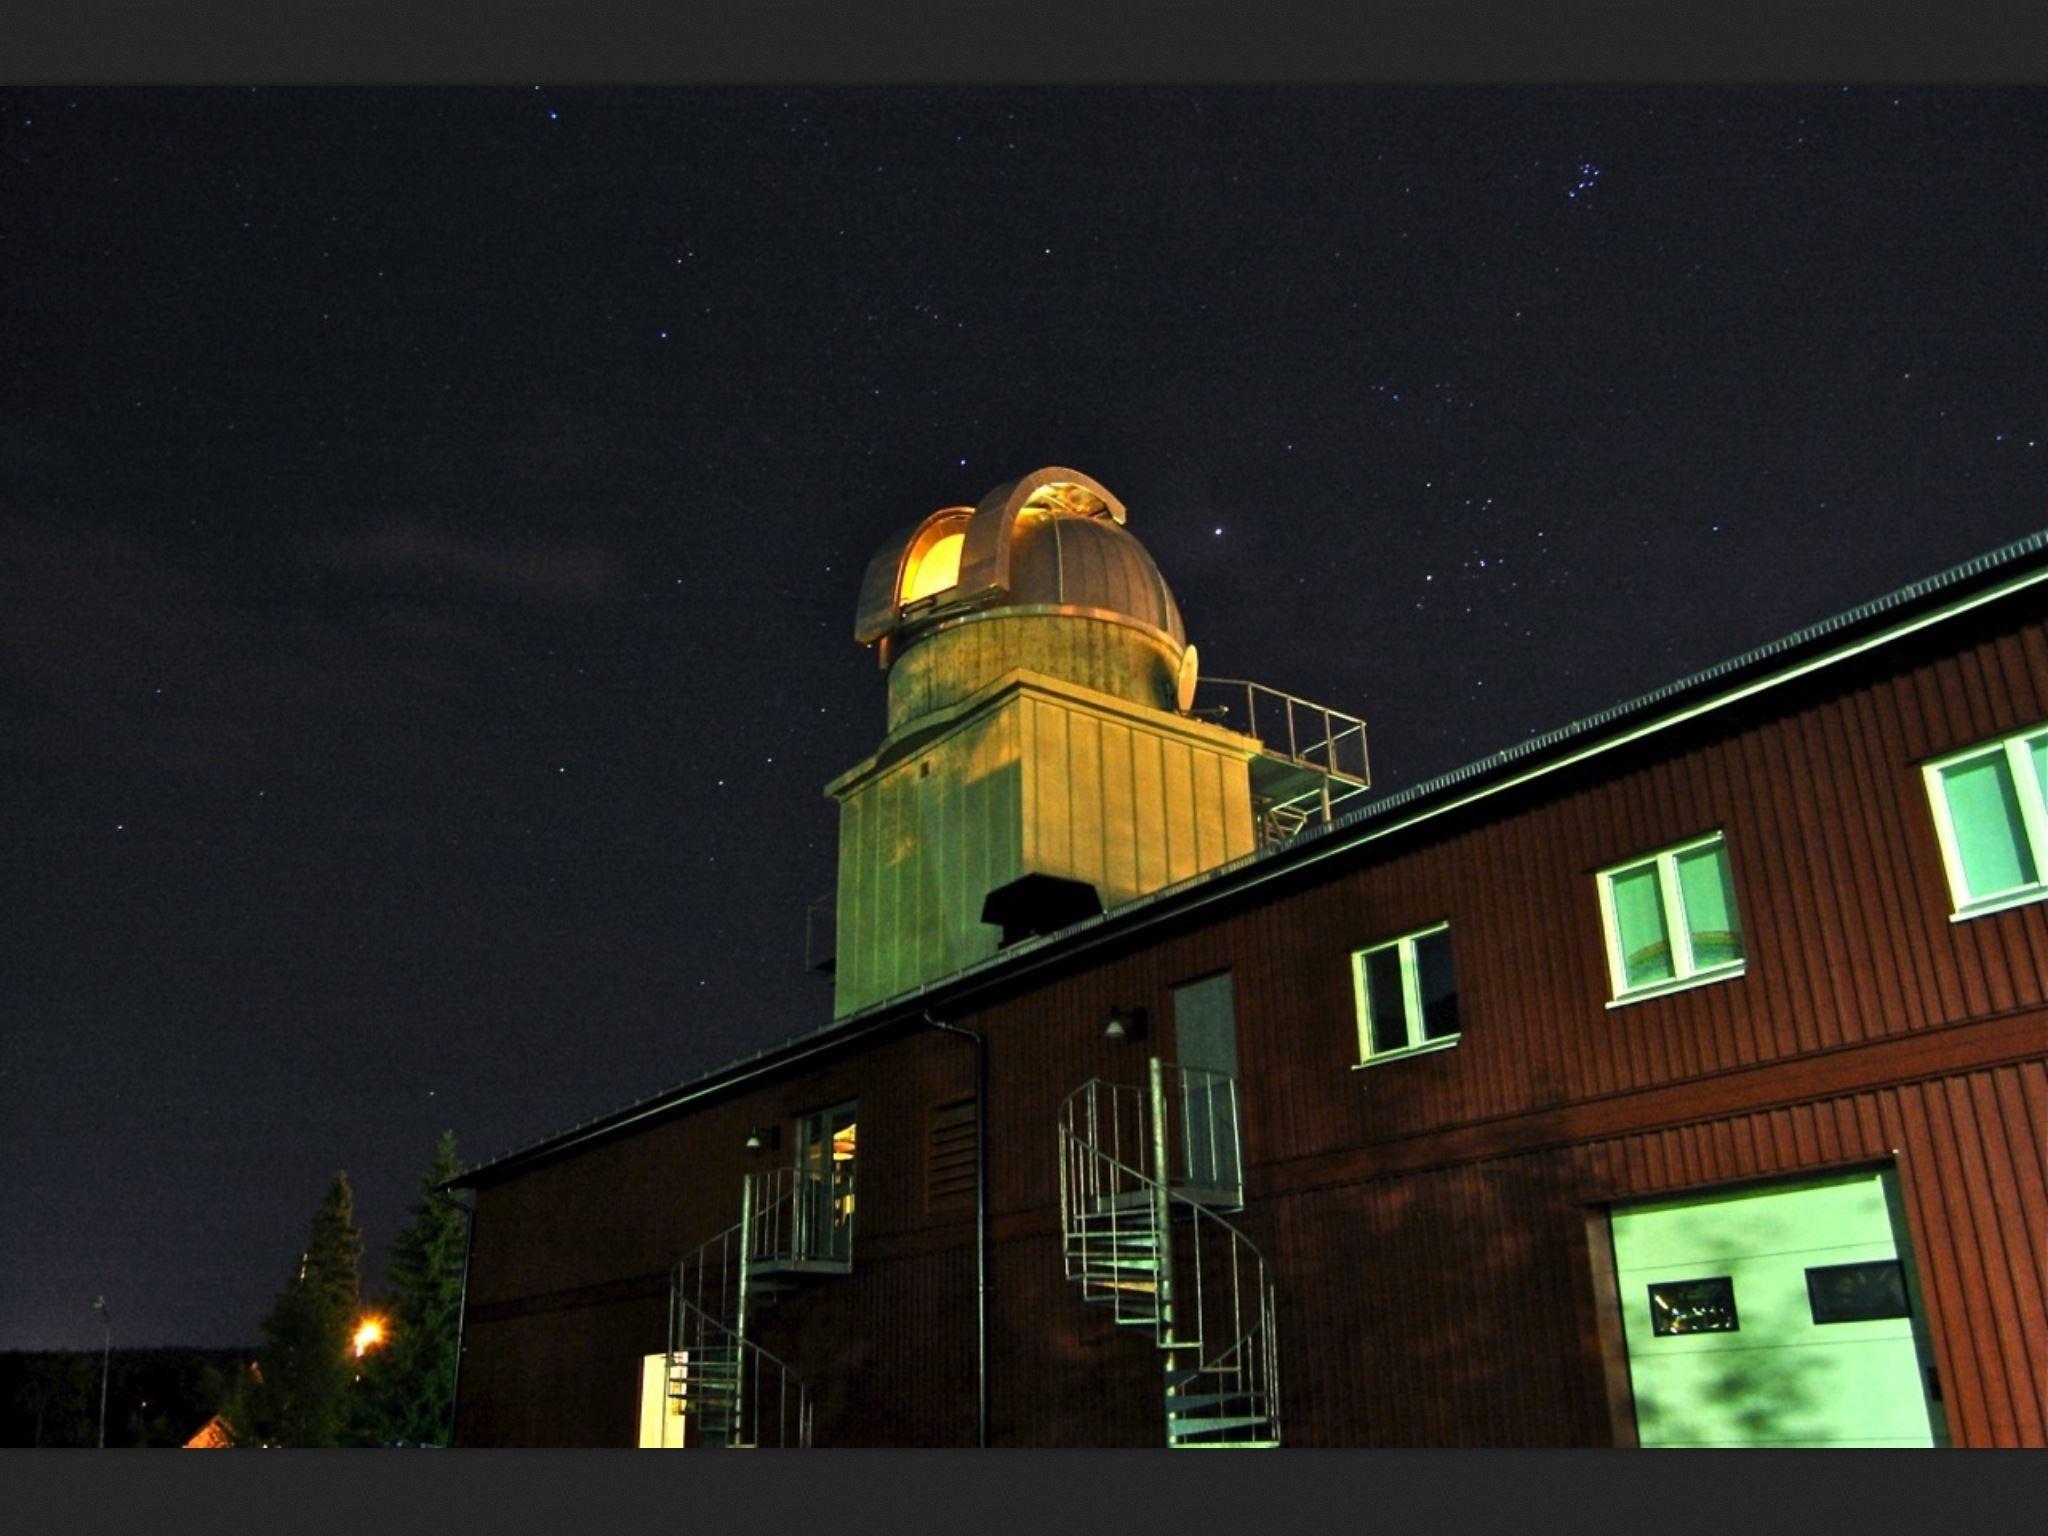 Umevatoriet - Umeå's observatory